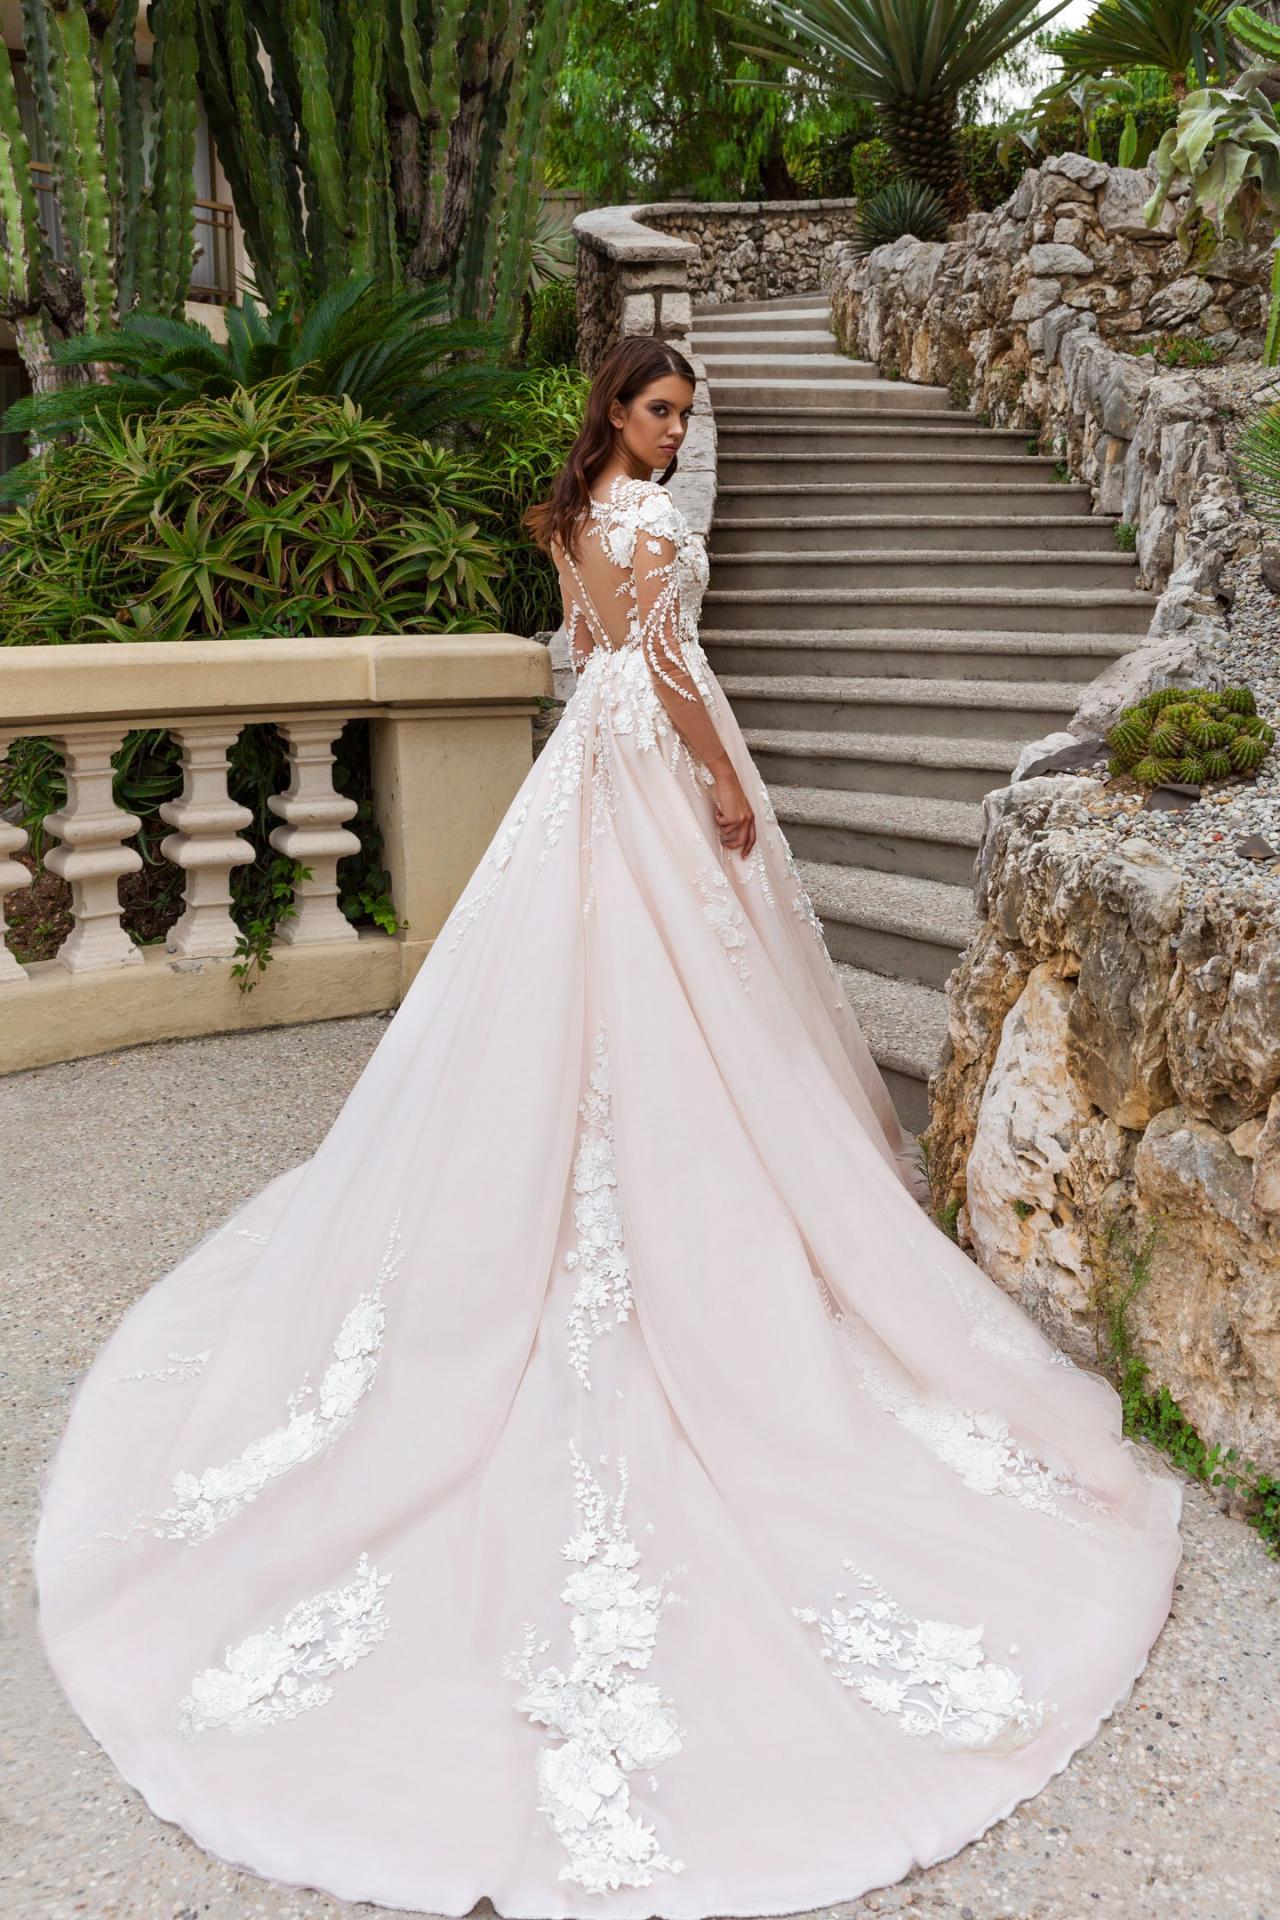 Robe de mariee a louer nice